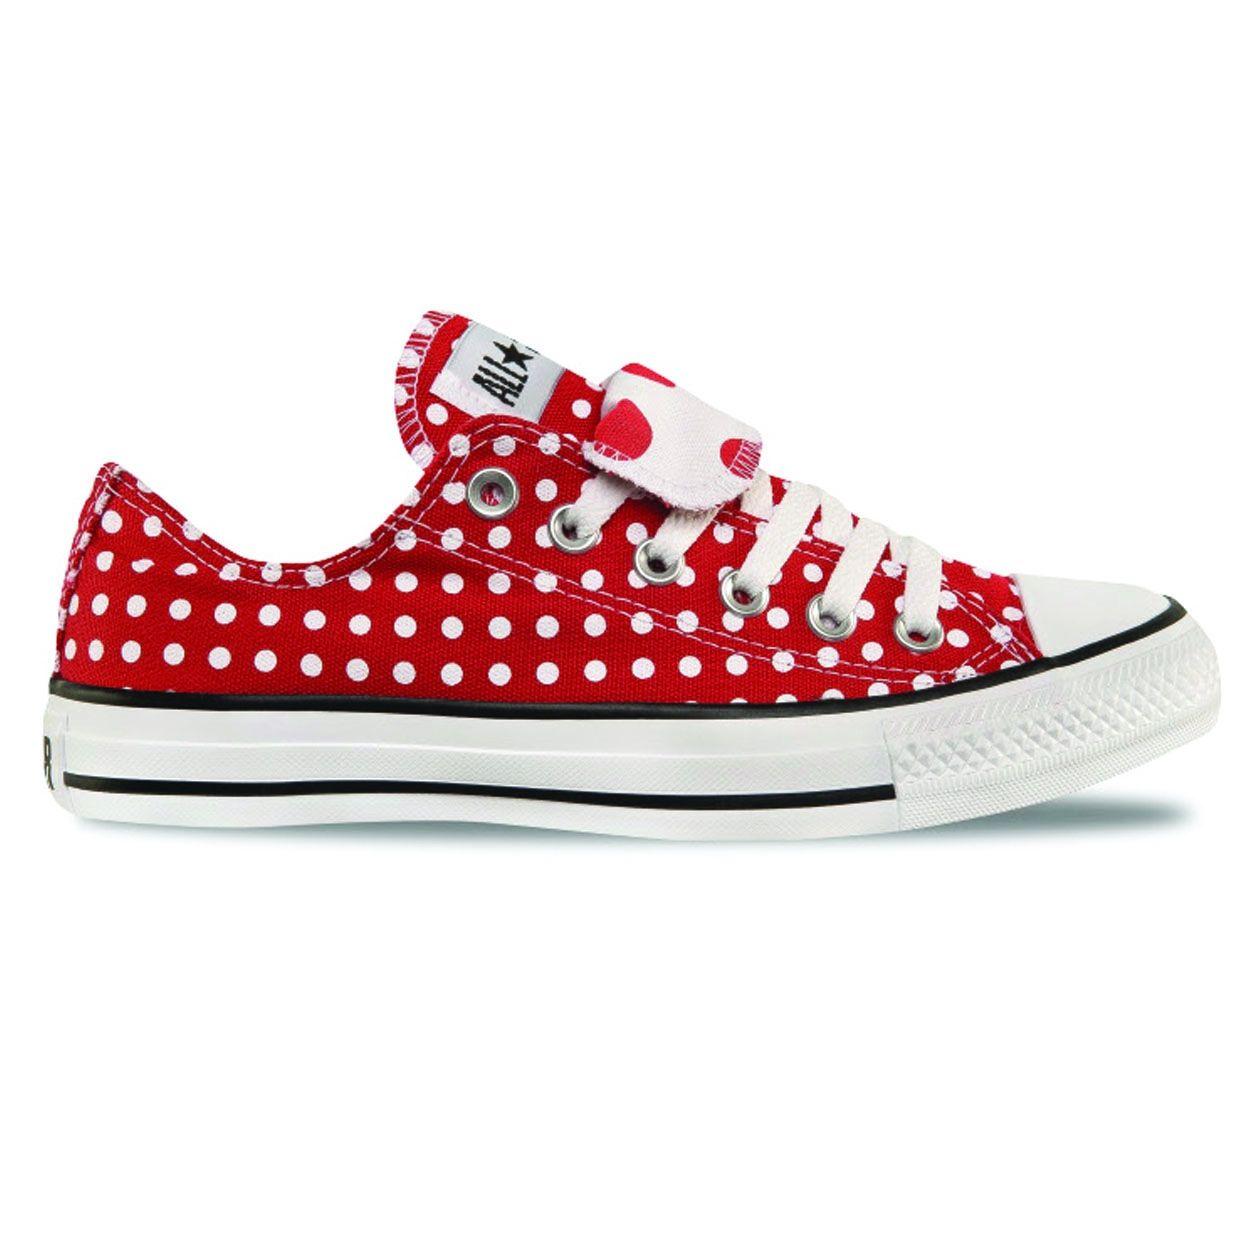 Polka Dot Converse - Red                                                                                                                                                                                 More